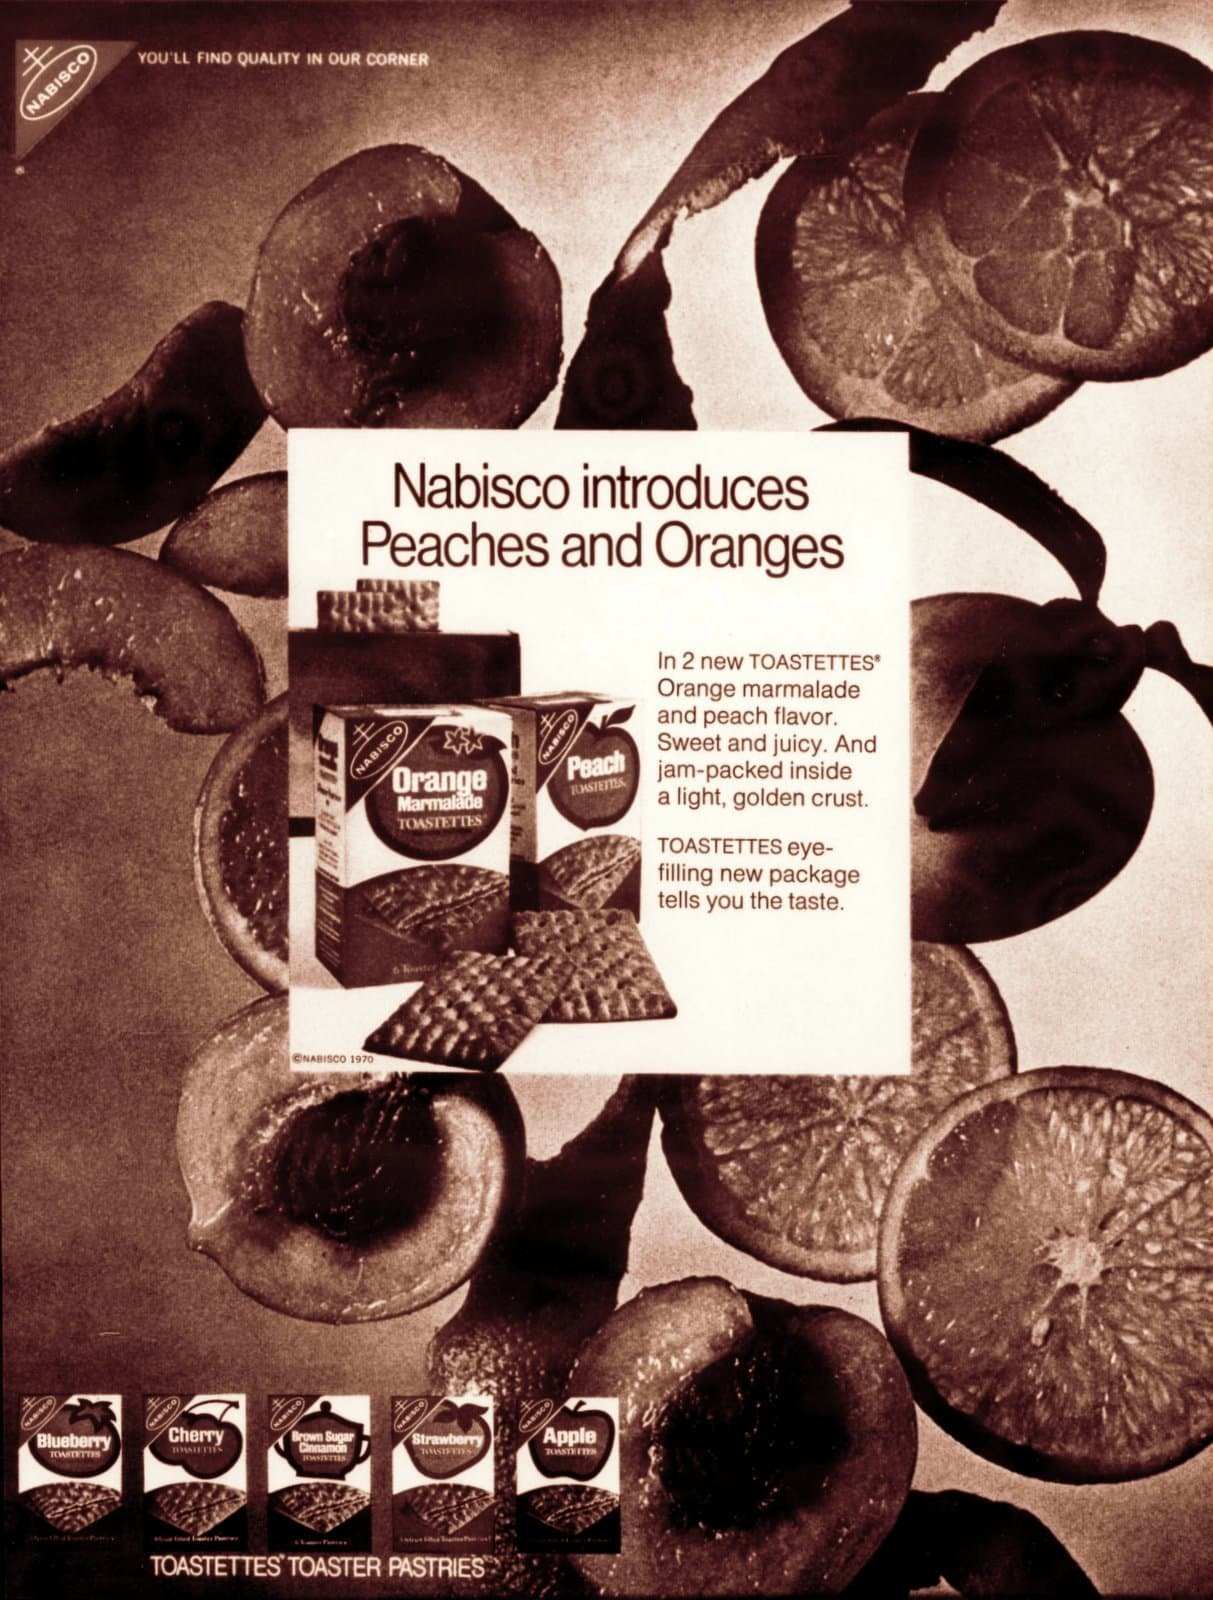 Peach and orange Toastettes (1970)